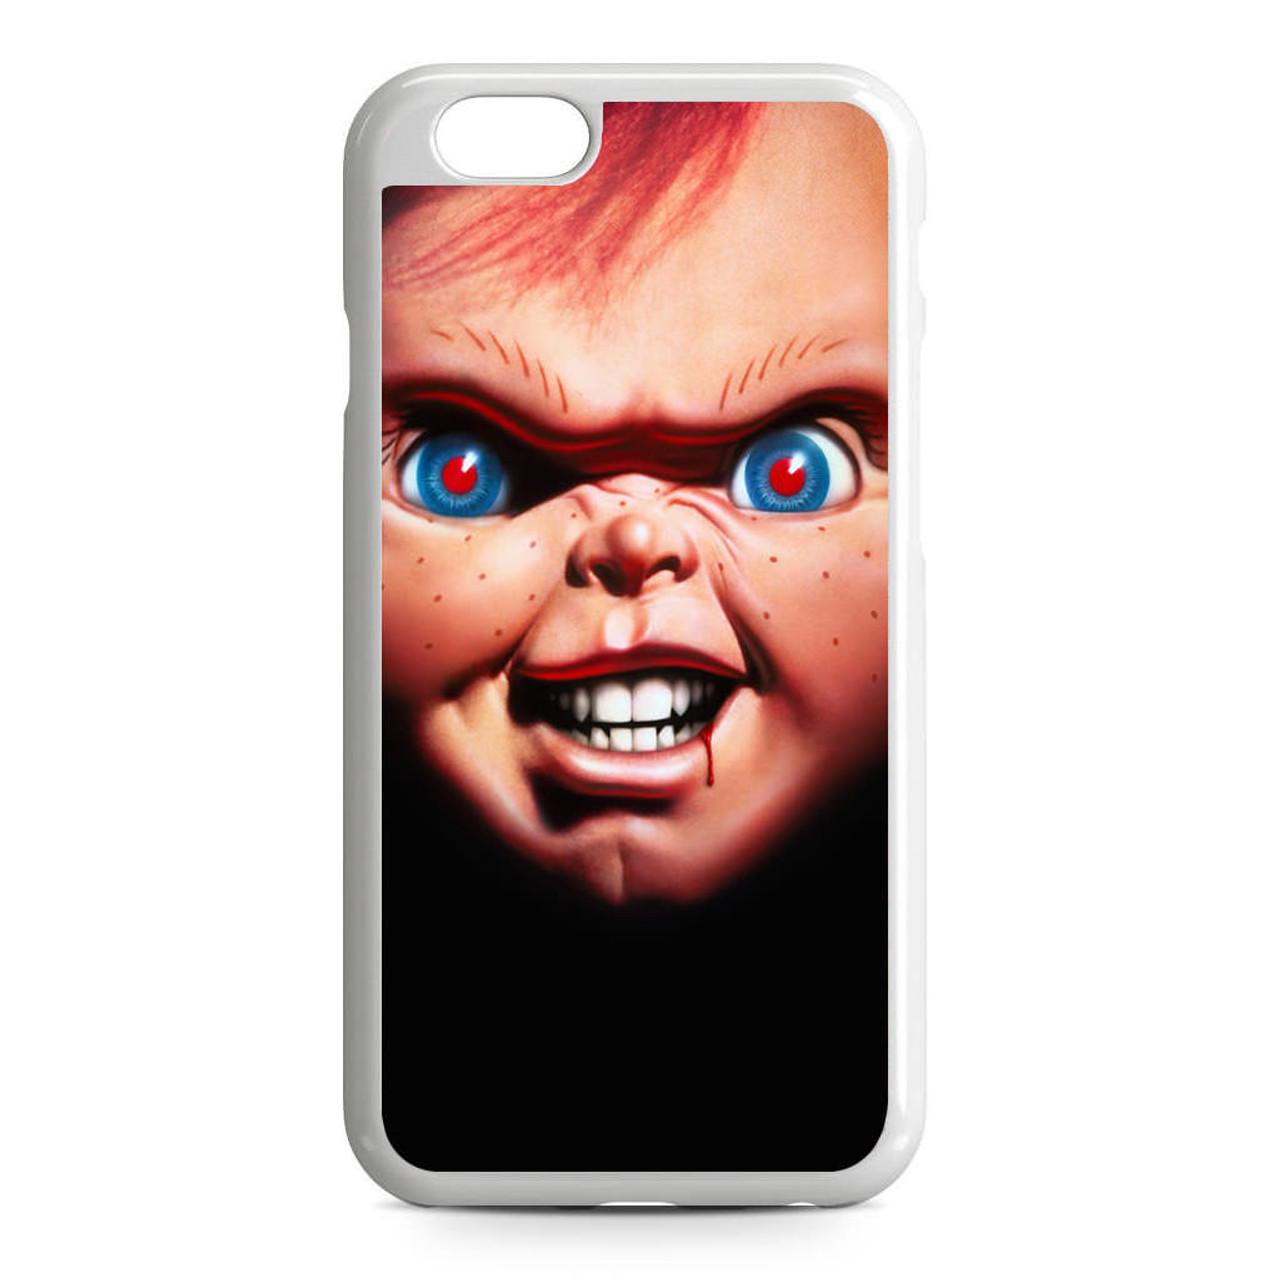 Chucky 2 iphone case